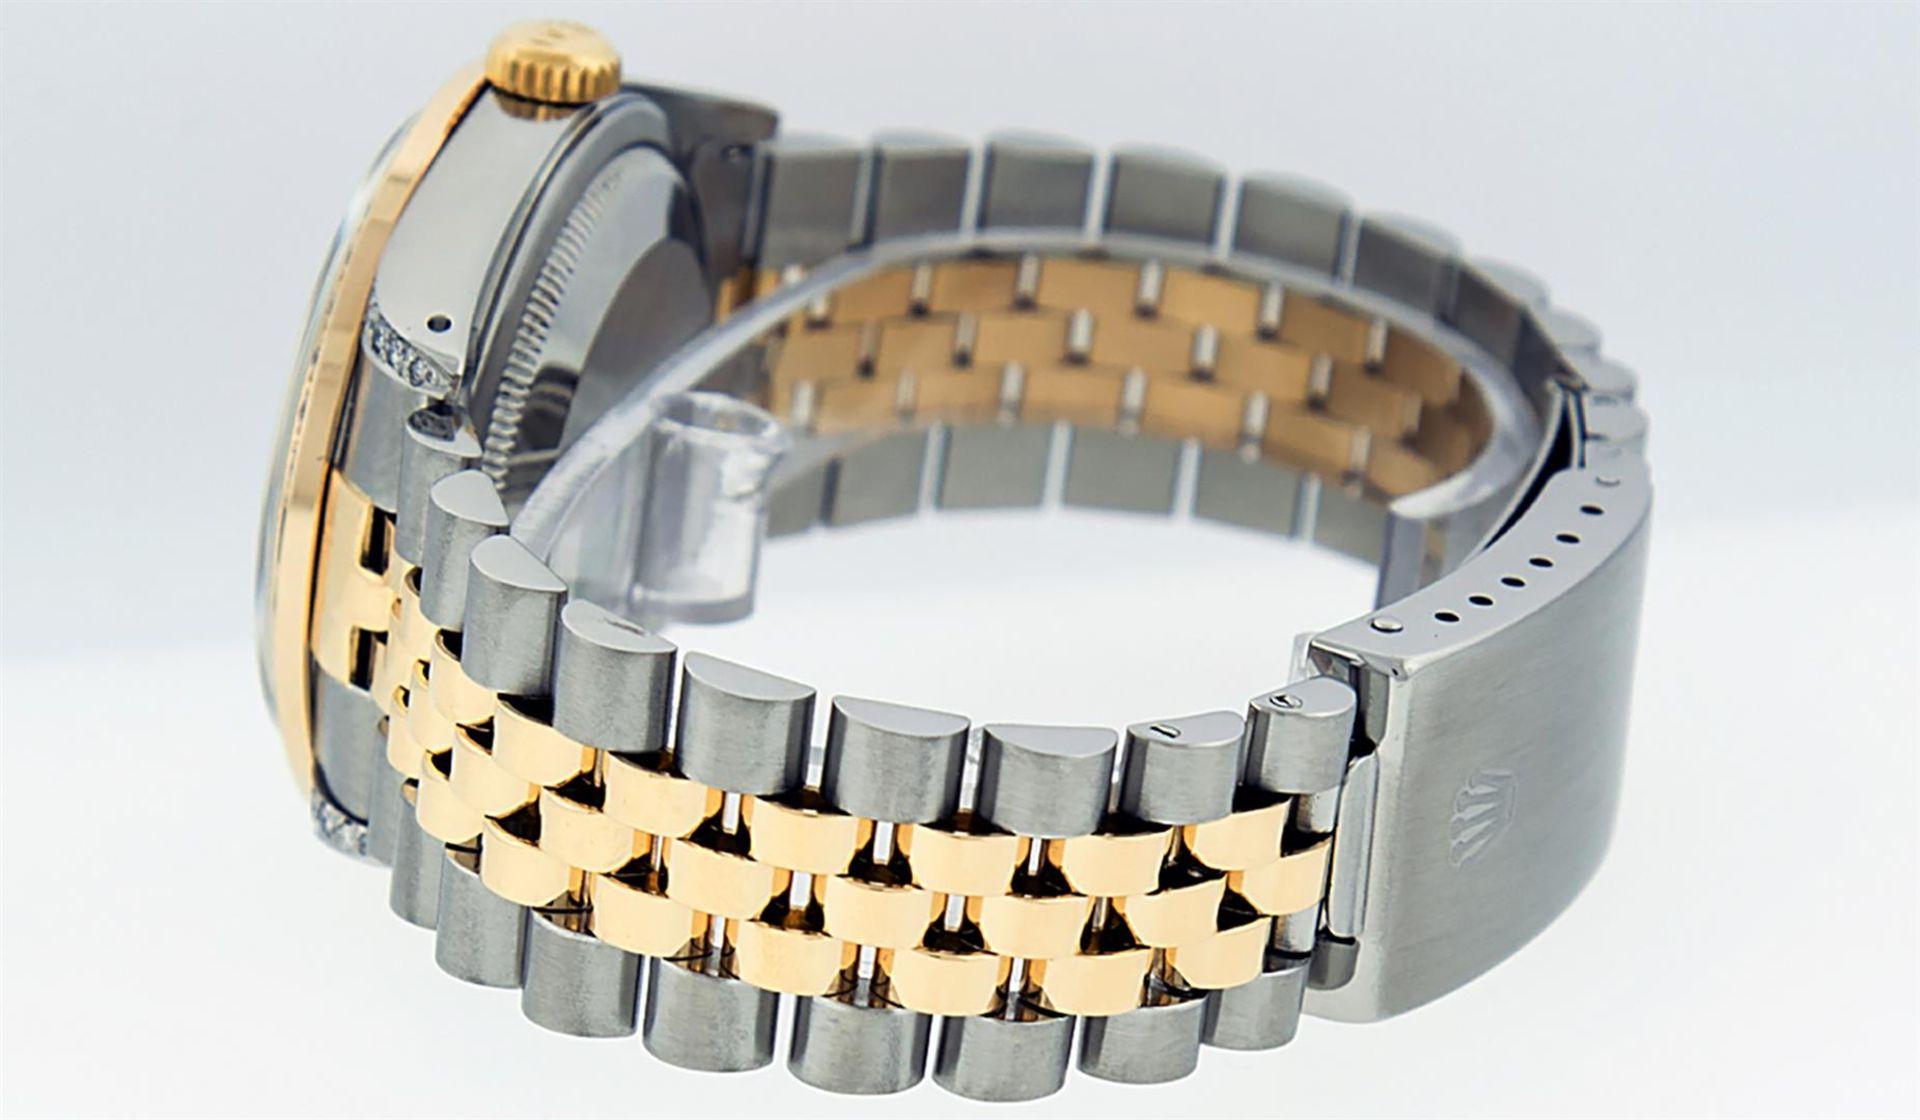 Rolex Mens 2 Tone Blue Vignette String Diamond Lugs Datejust Wristwatch - Image 8 of 8